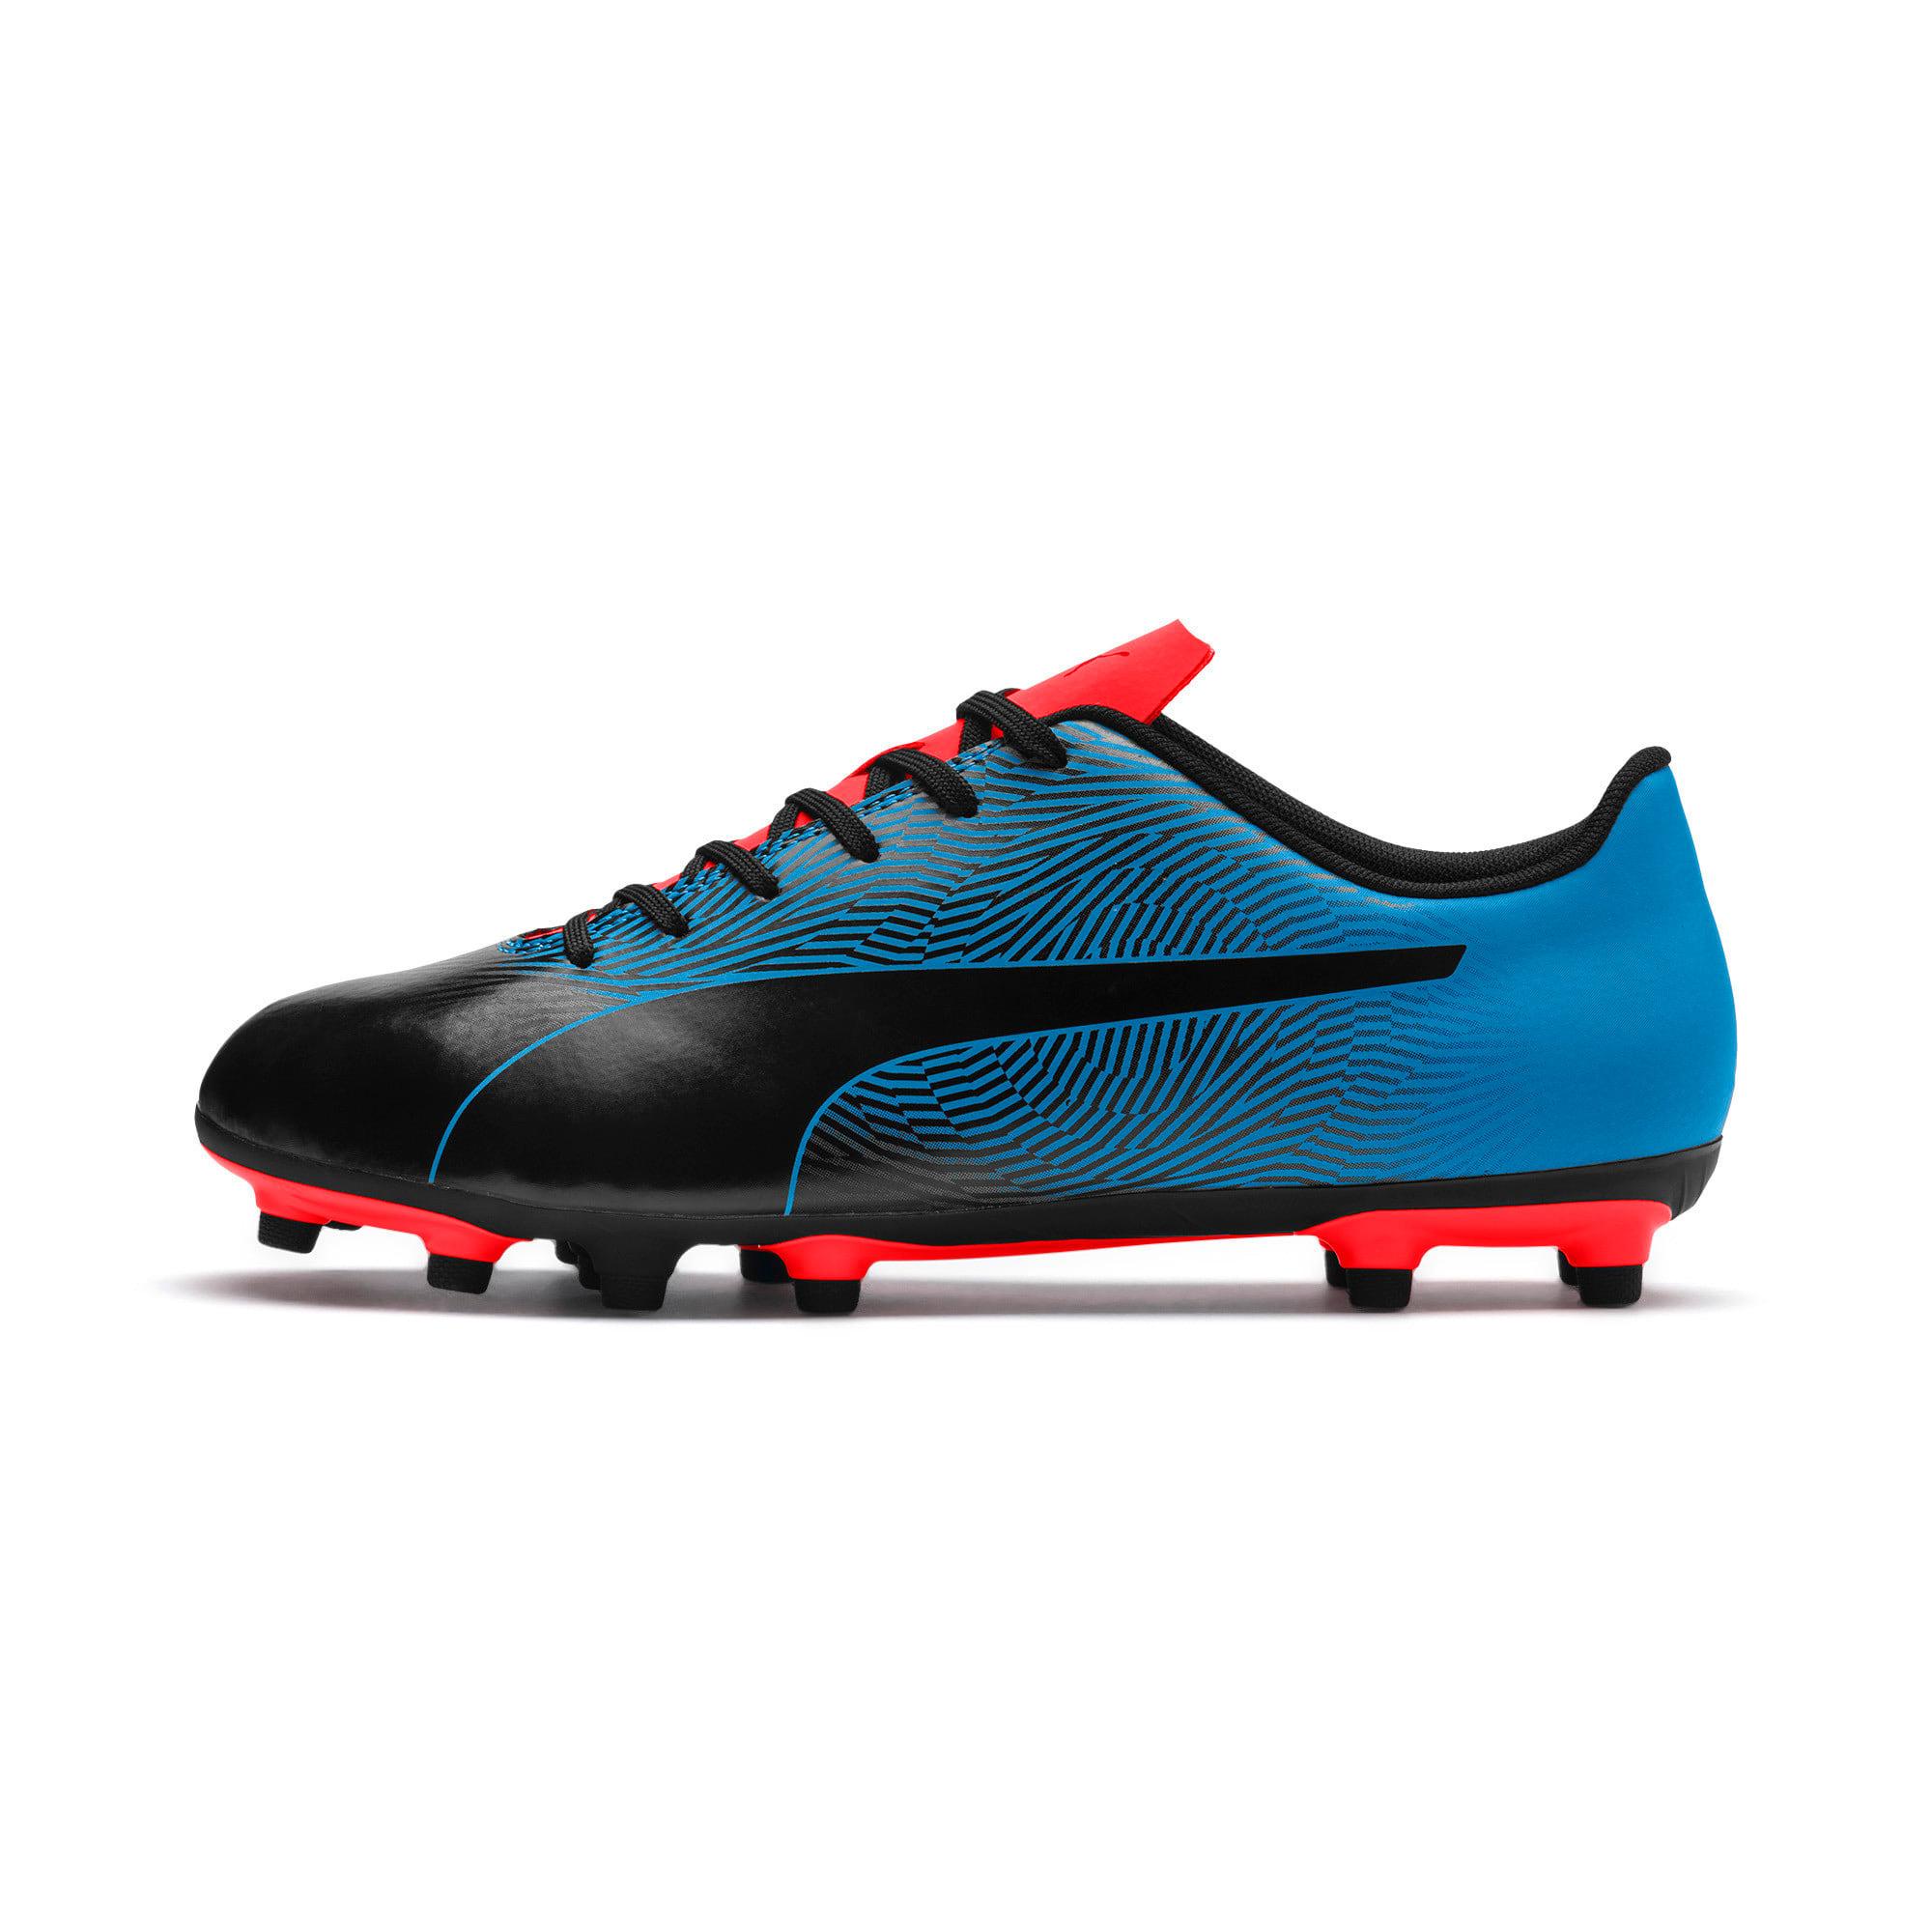 Miniatura 1 de Botines de fútbol PUMA Spirit II FG para hombre, Black-Bleu Azur-Red Blast, mediano